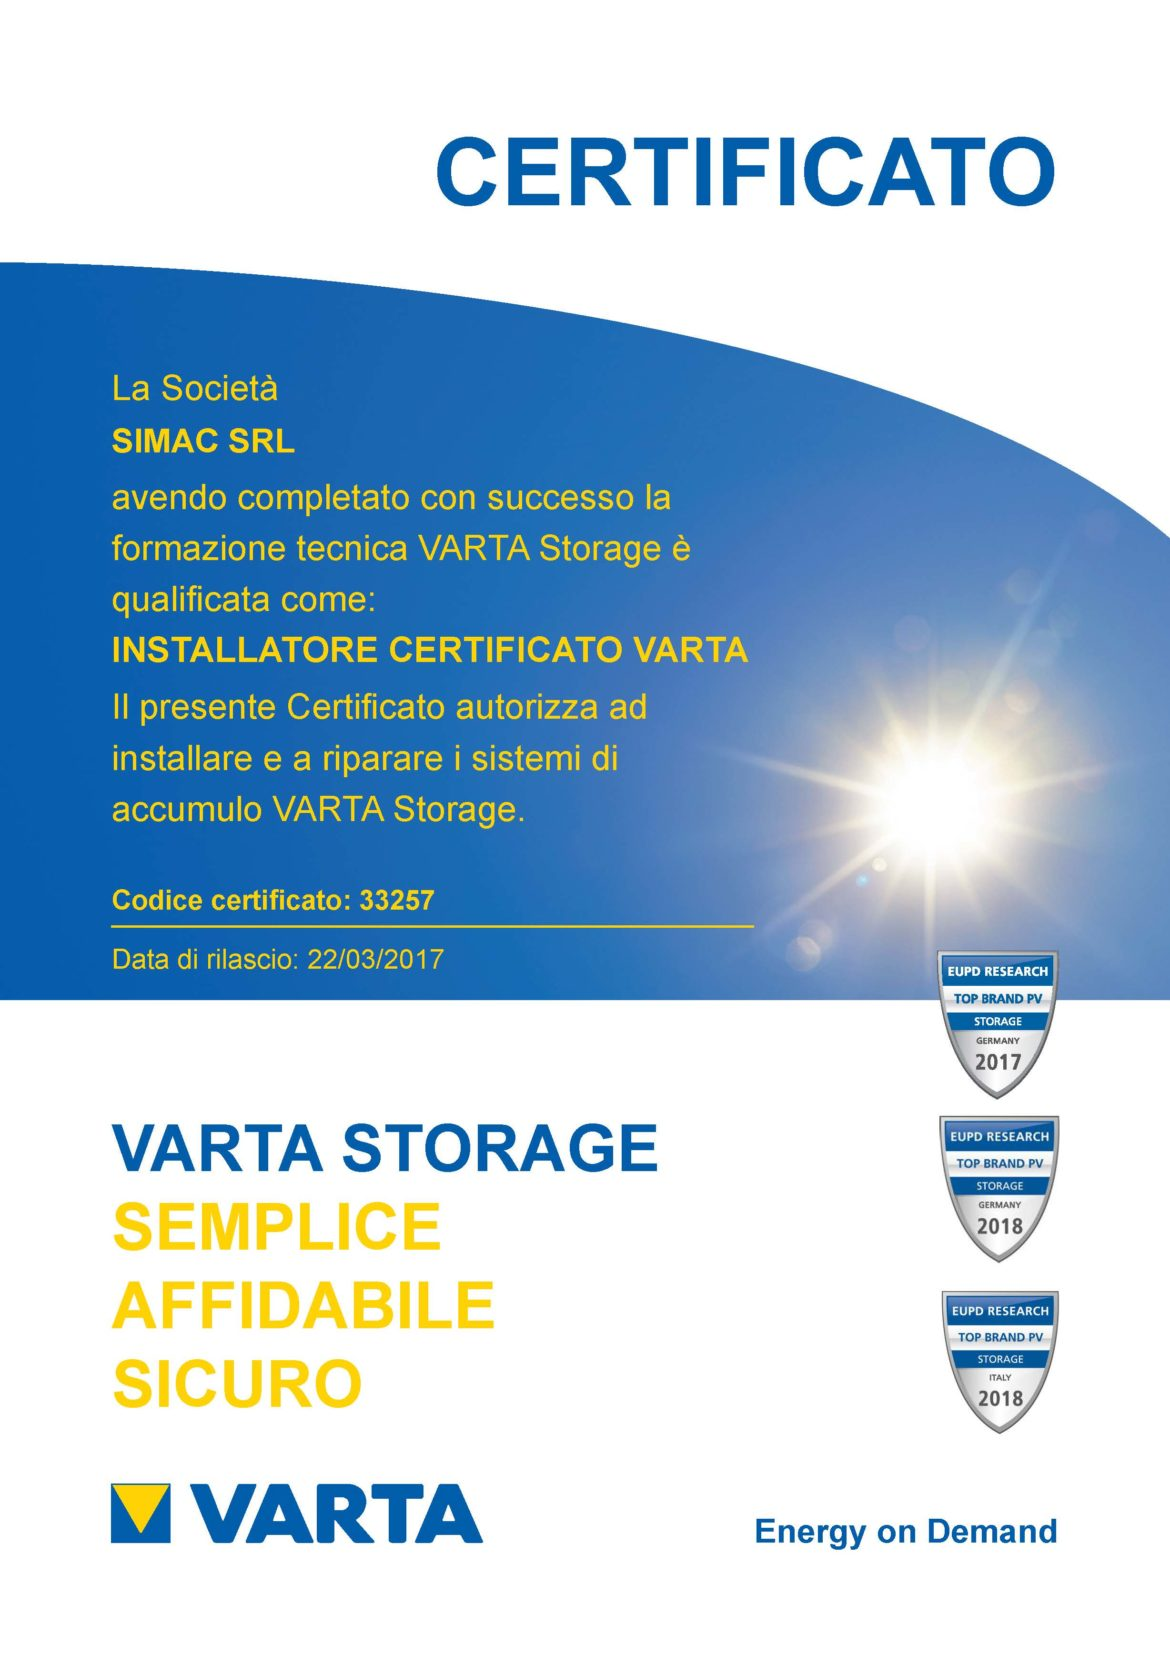 VARTA-Certificato-Installatore-certificato.jpg